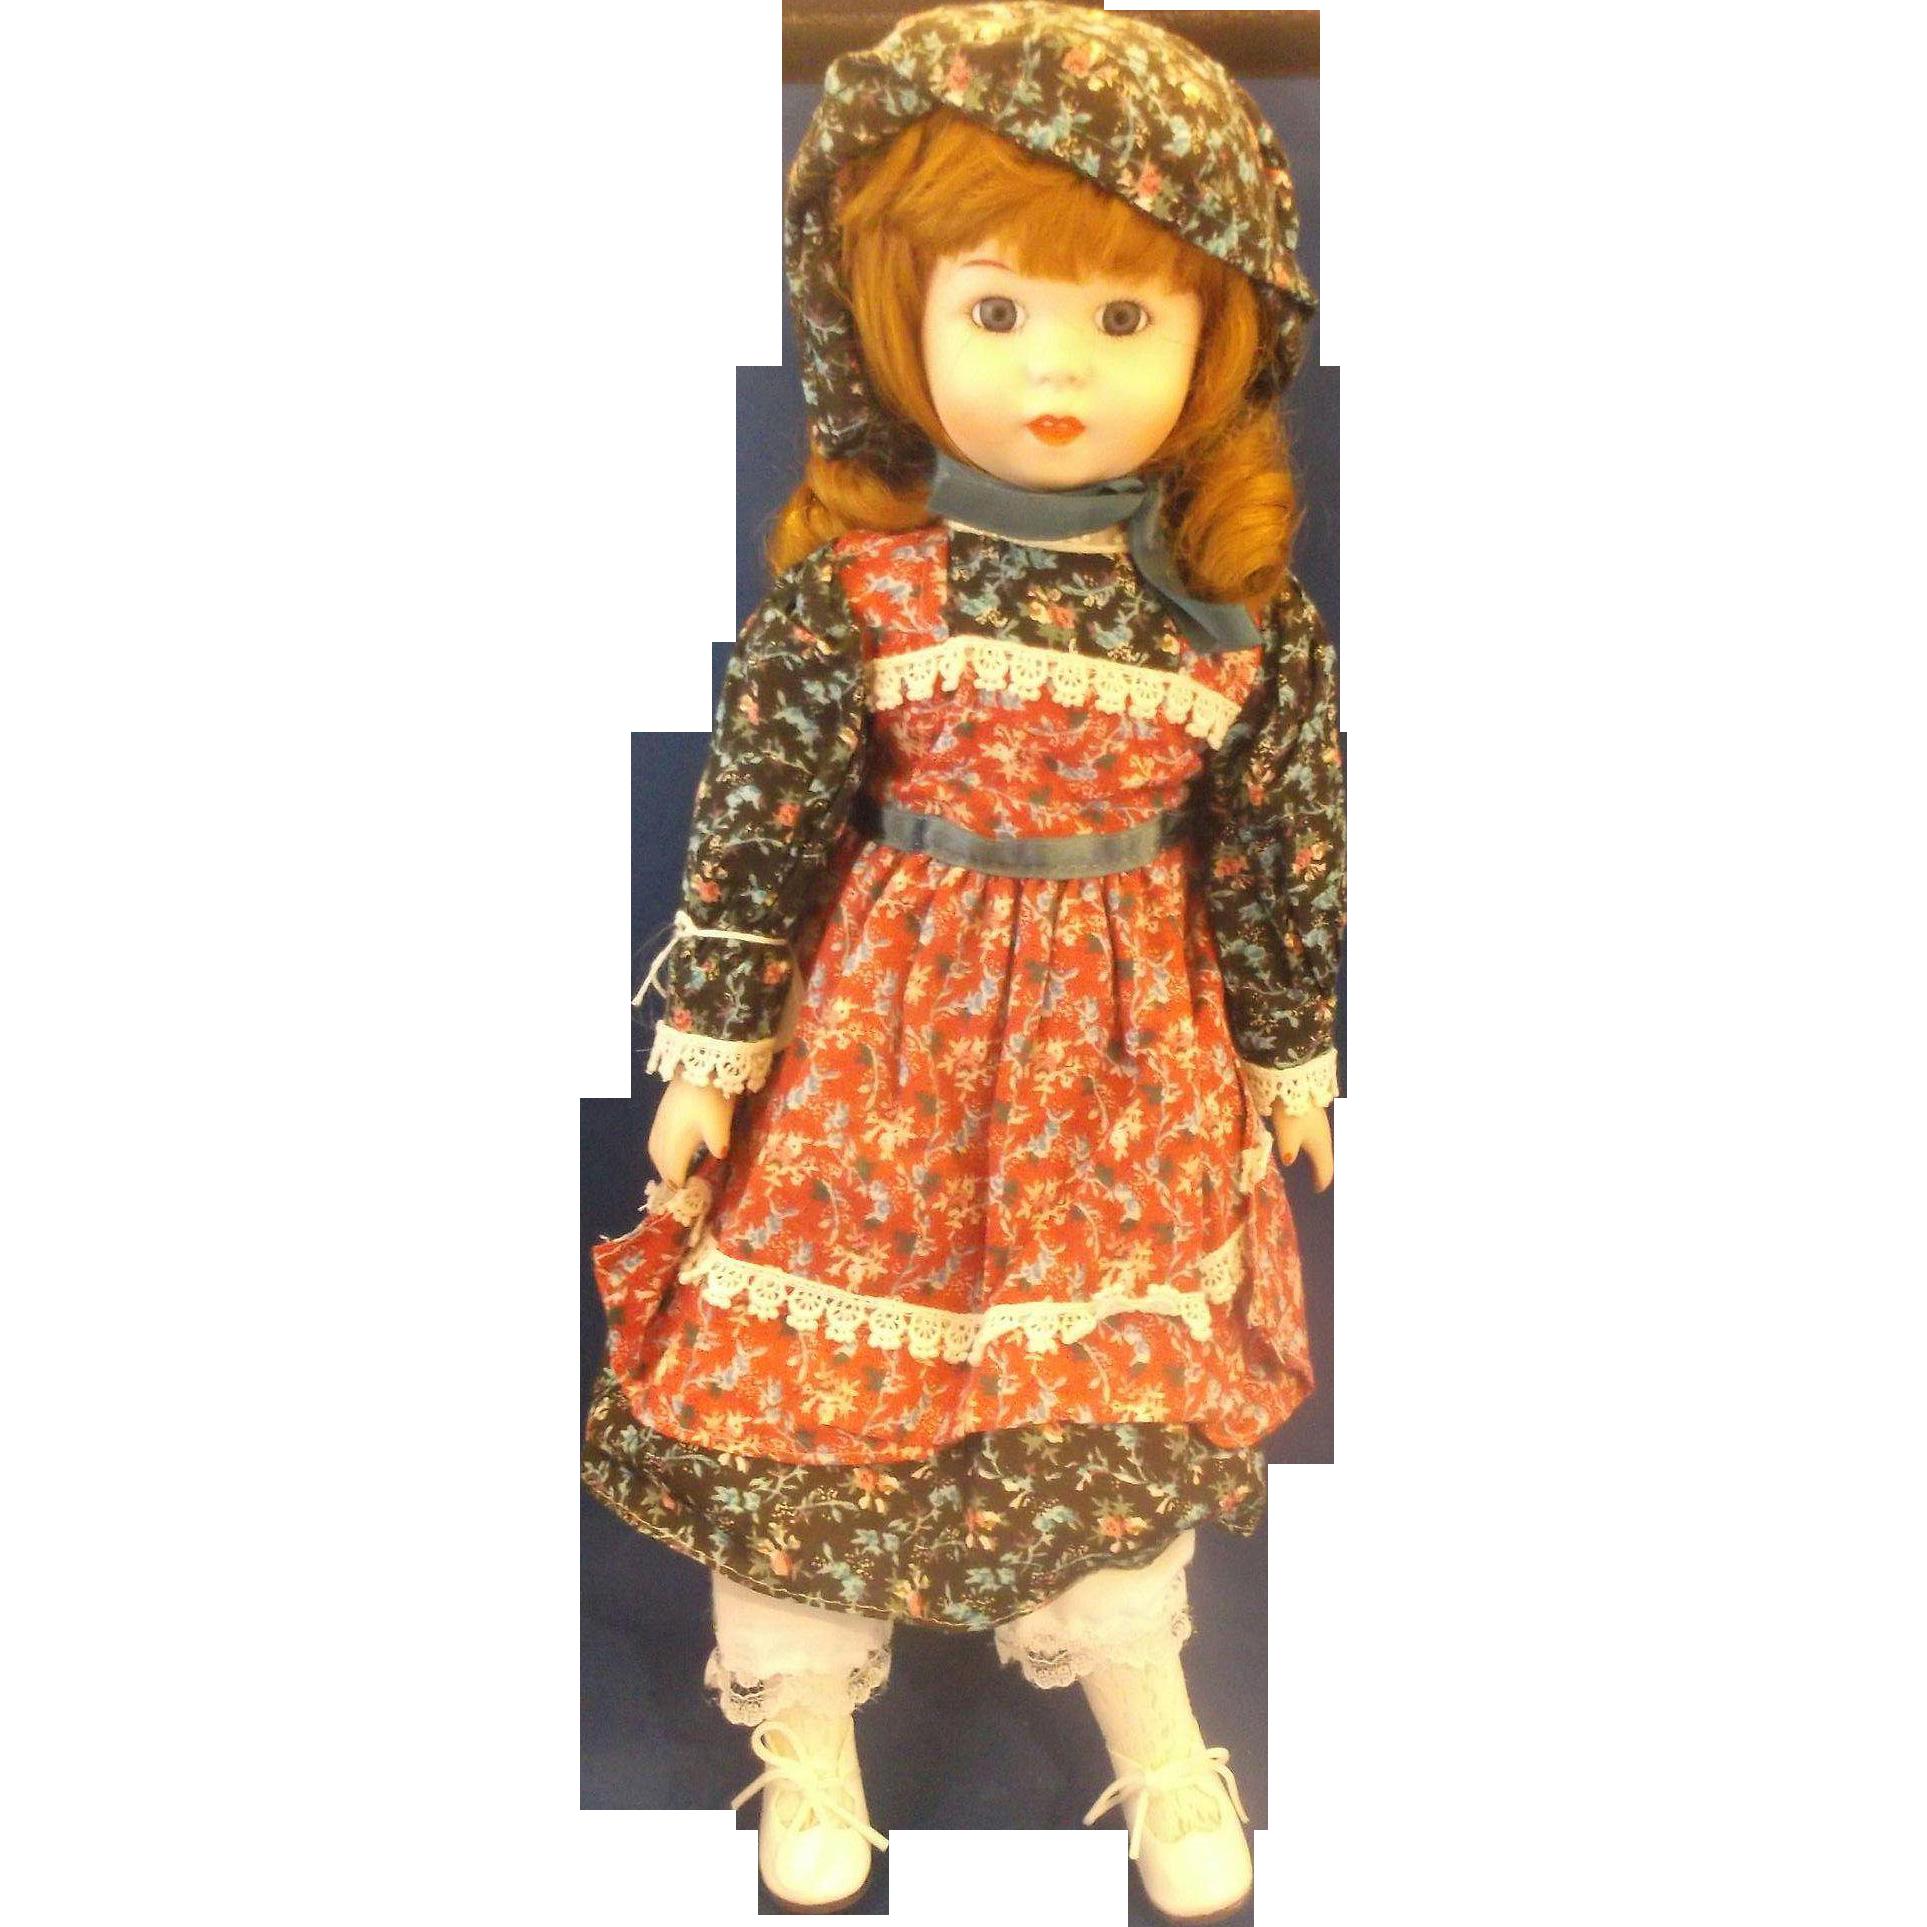 Heritage Mint Porcelain Doll 1989 Calico Dress Bonnet 16 IN